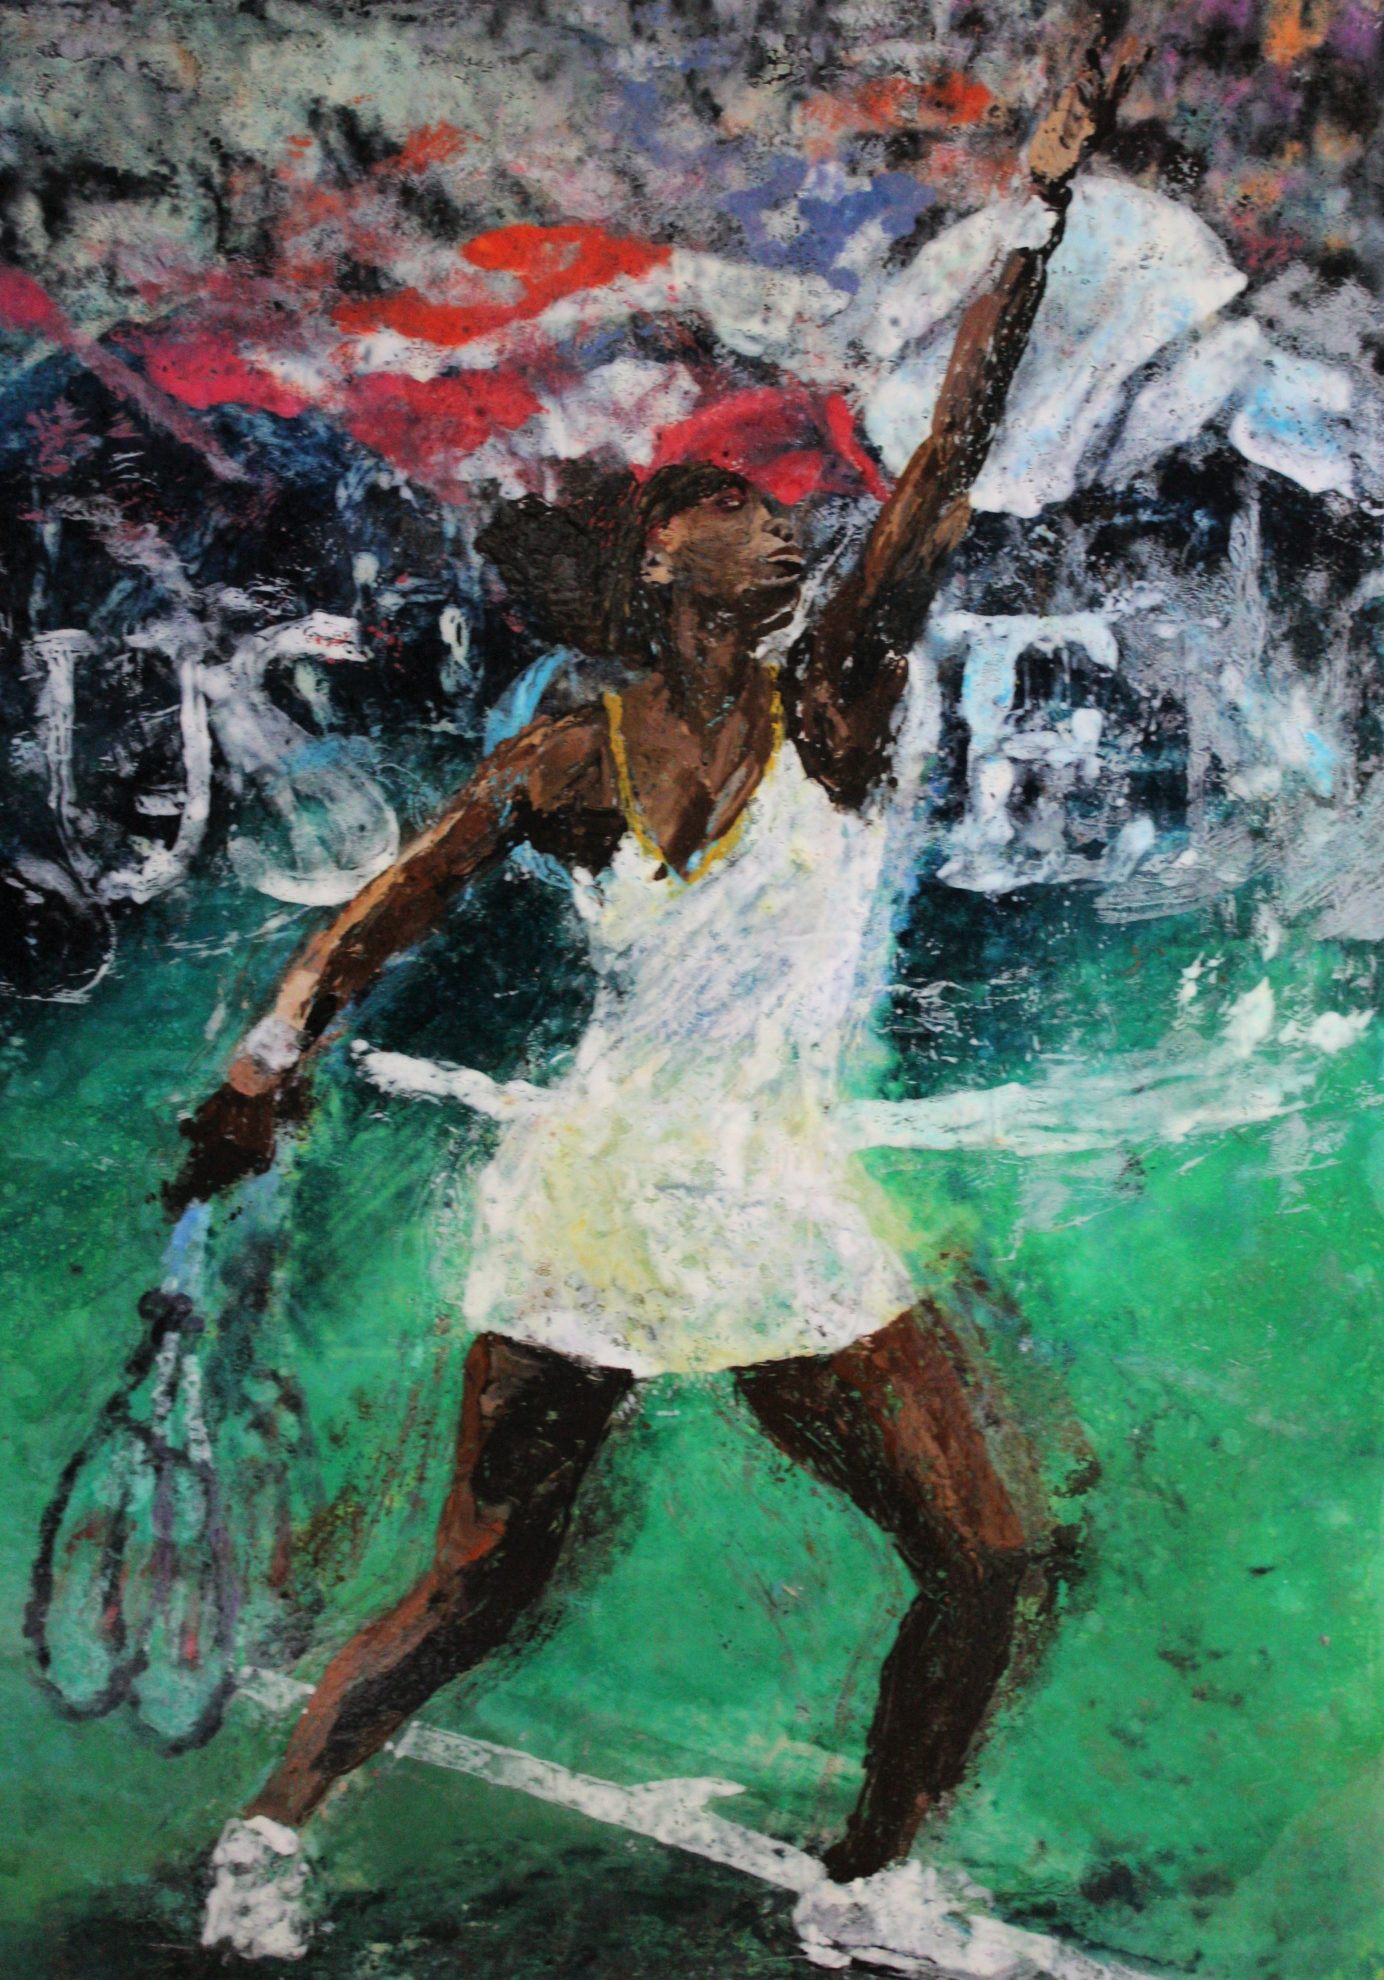 Venus Williams, 2001 US Open Champion